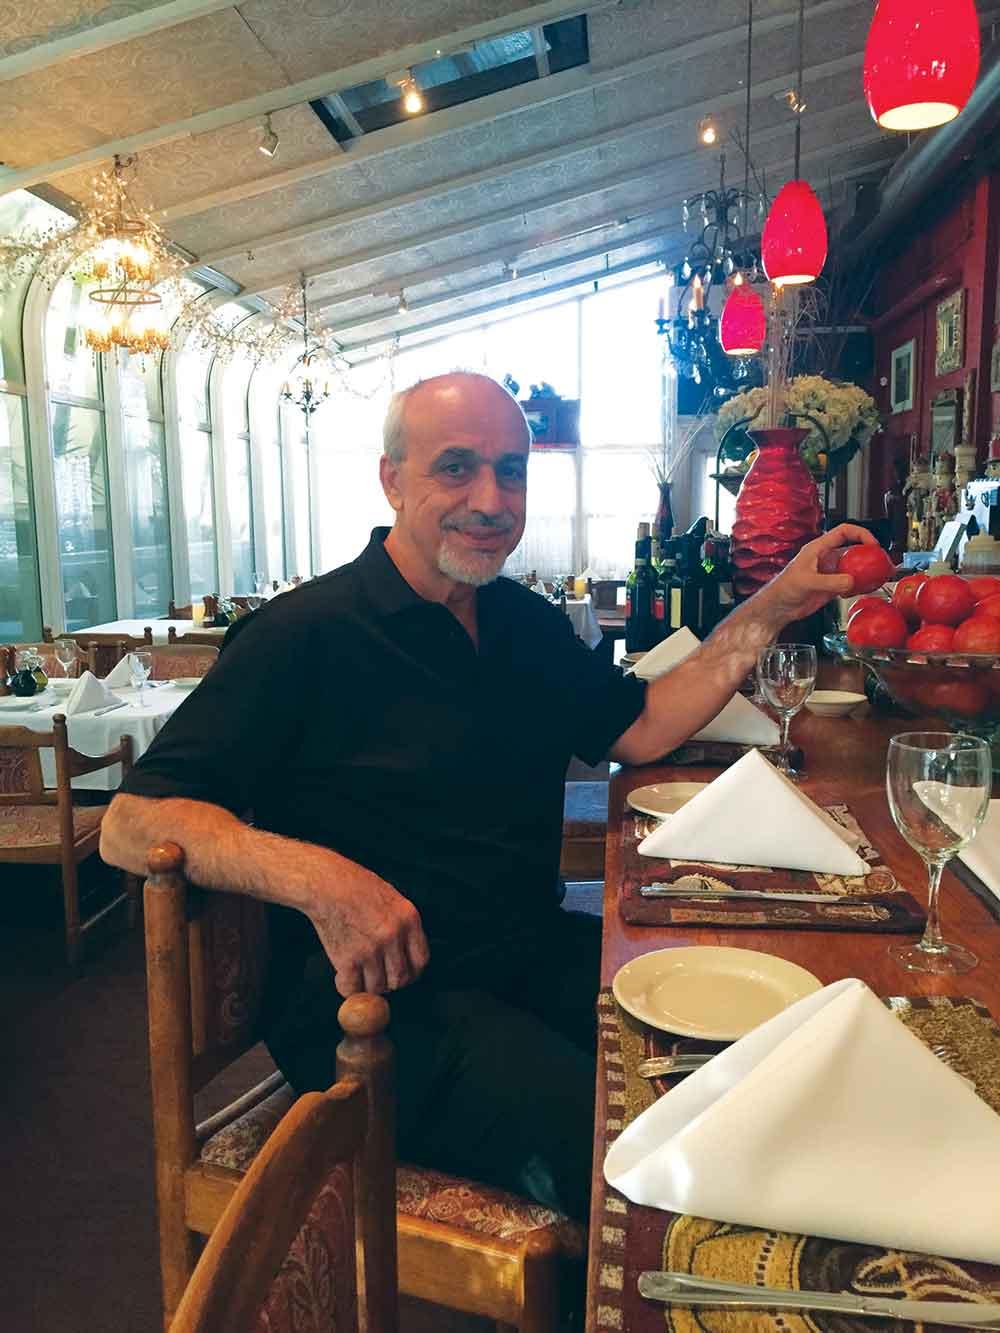 Chef Reza Azeri sits at the bar top of his restaurant Baci Bistro located in Kailua. – Kristen Kumakura